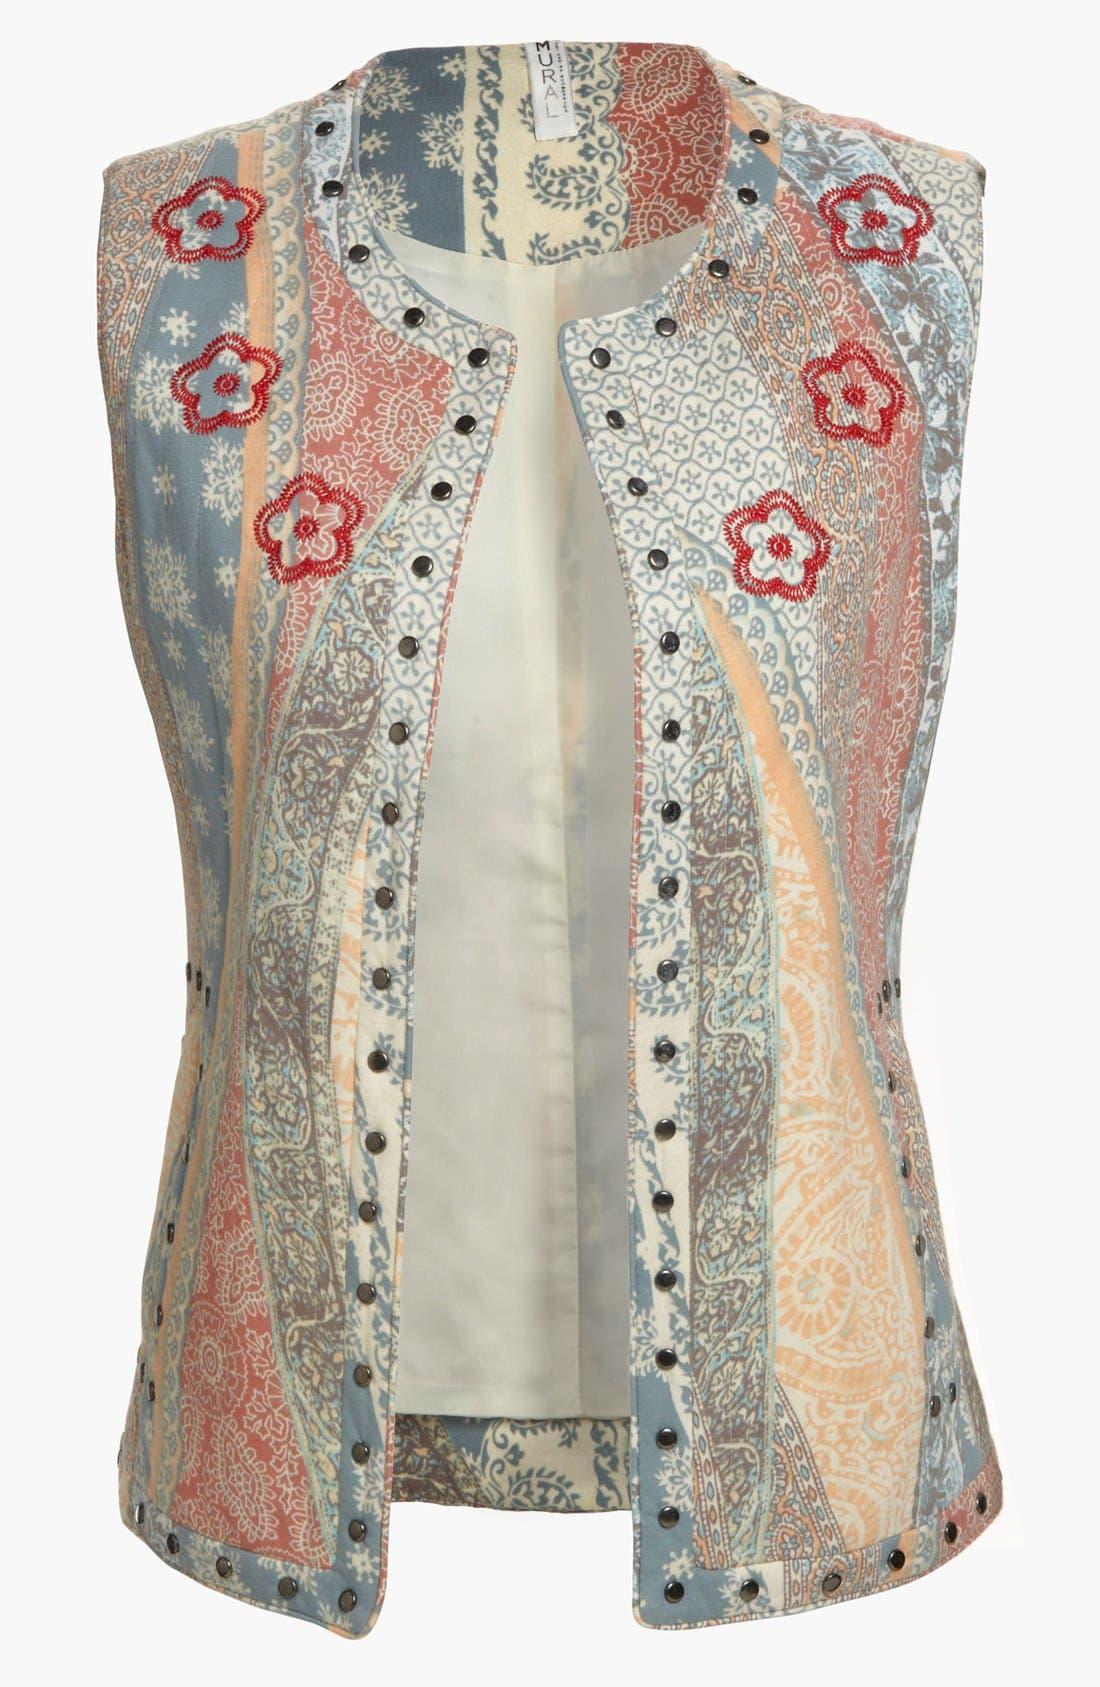 Alternate Image 1 Selected - Mural Flowing Floral Vest